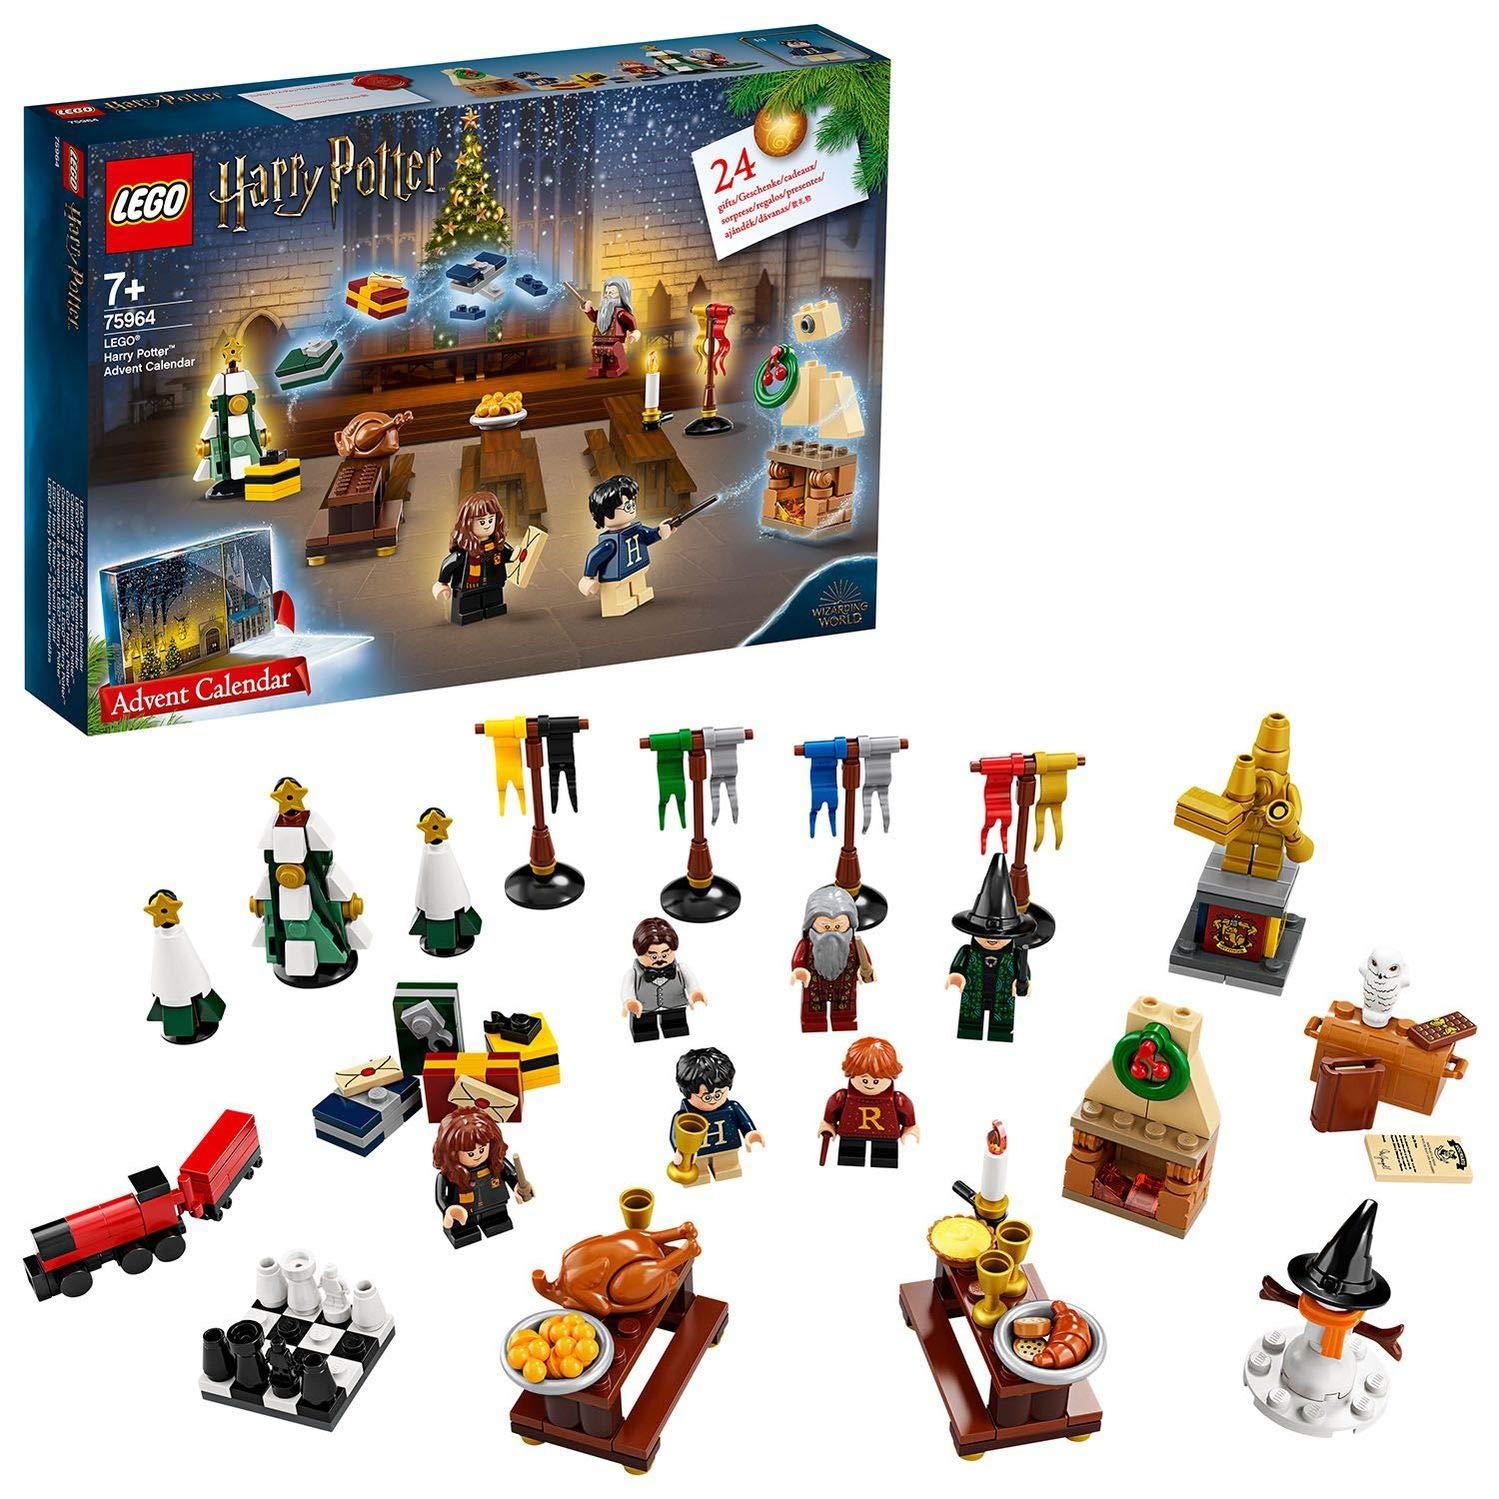 LEGO 75964 Harry Potter Advent Calendar 2019 with 7 Minifigures £19.19 at Amazon Prime / £23.68 Non Prime